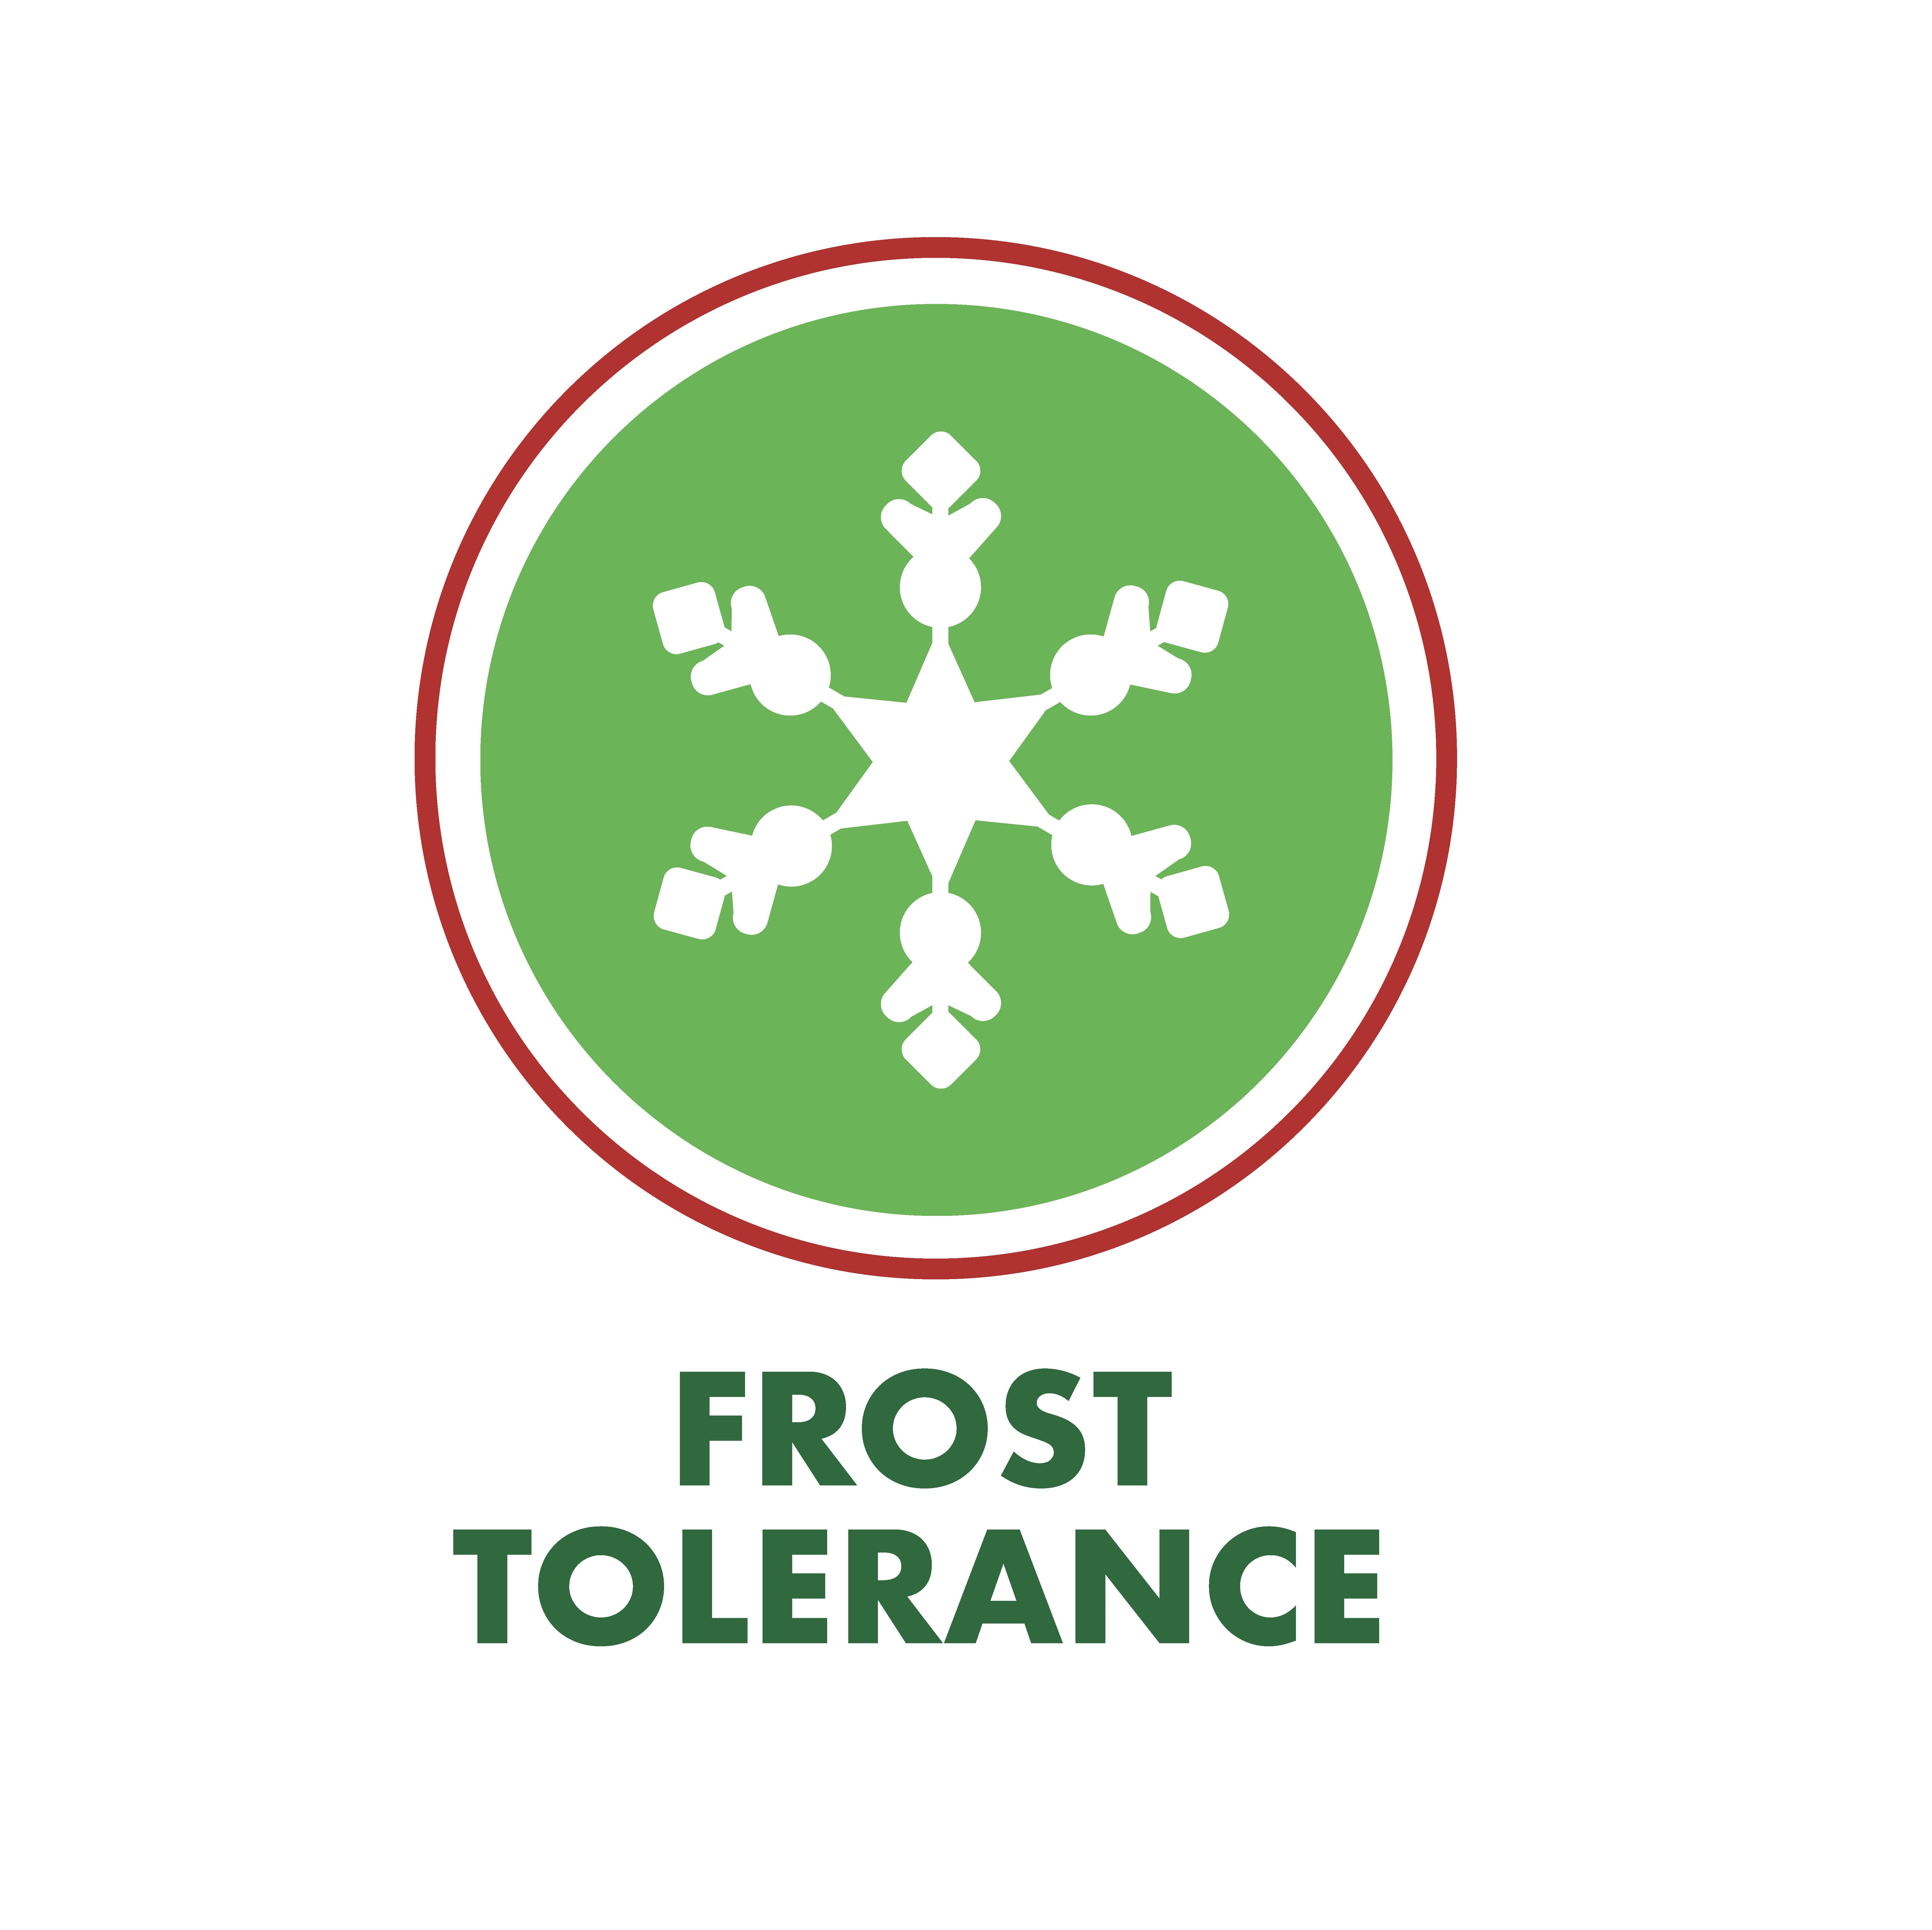 Frost Tolerance